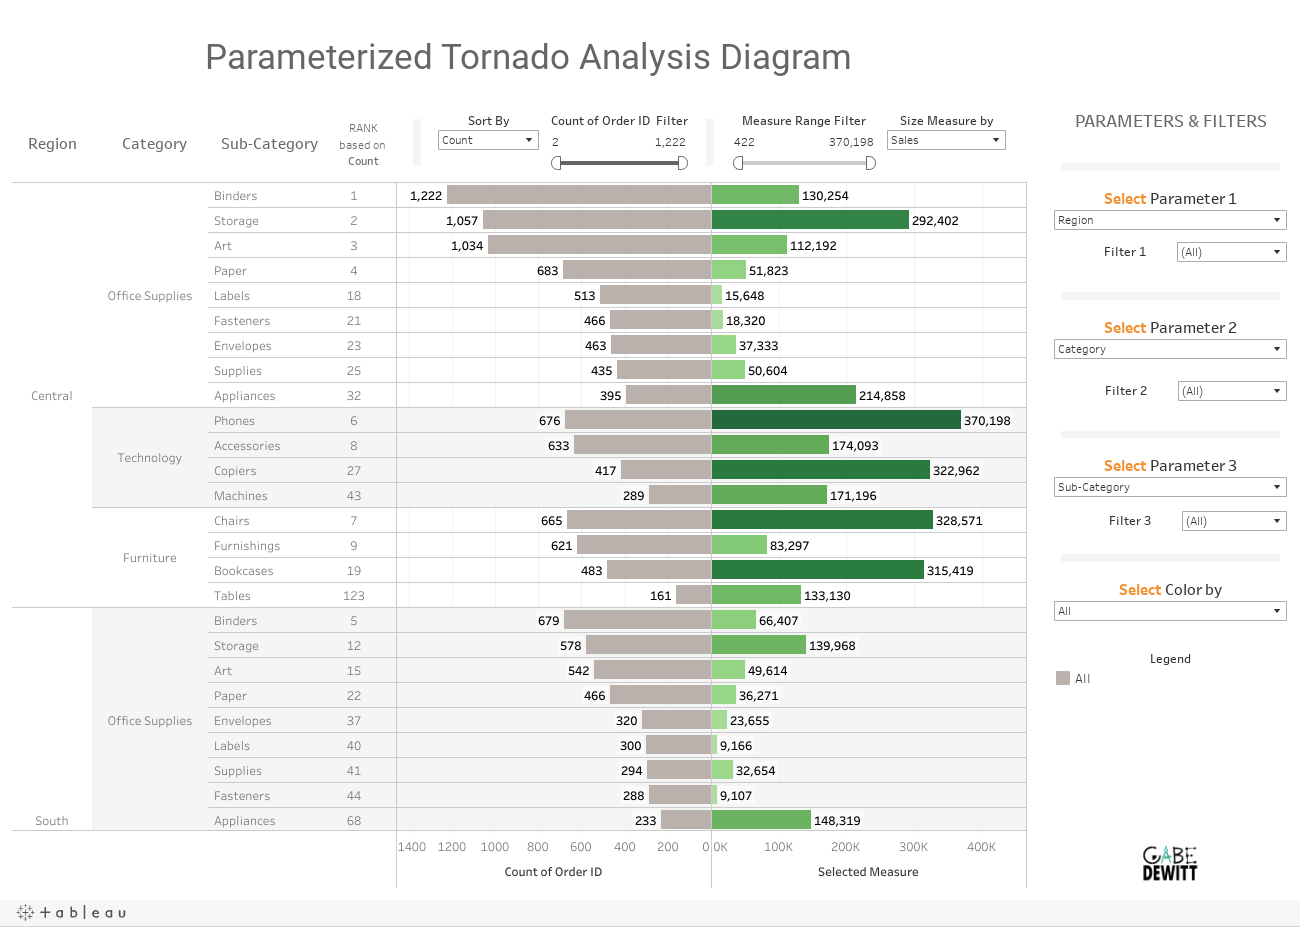 https://public.tableau.com/static/images/Pa/ParameterizedTornadoAnalysisDiagram/ParameterizedTornadoAnalysisDiagram/1.png